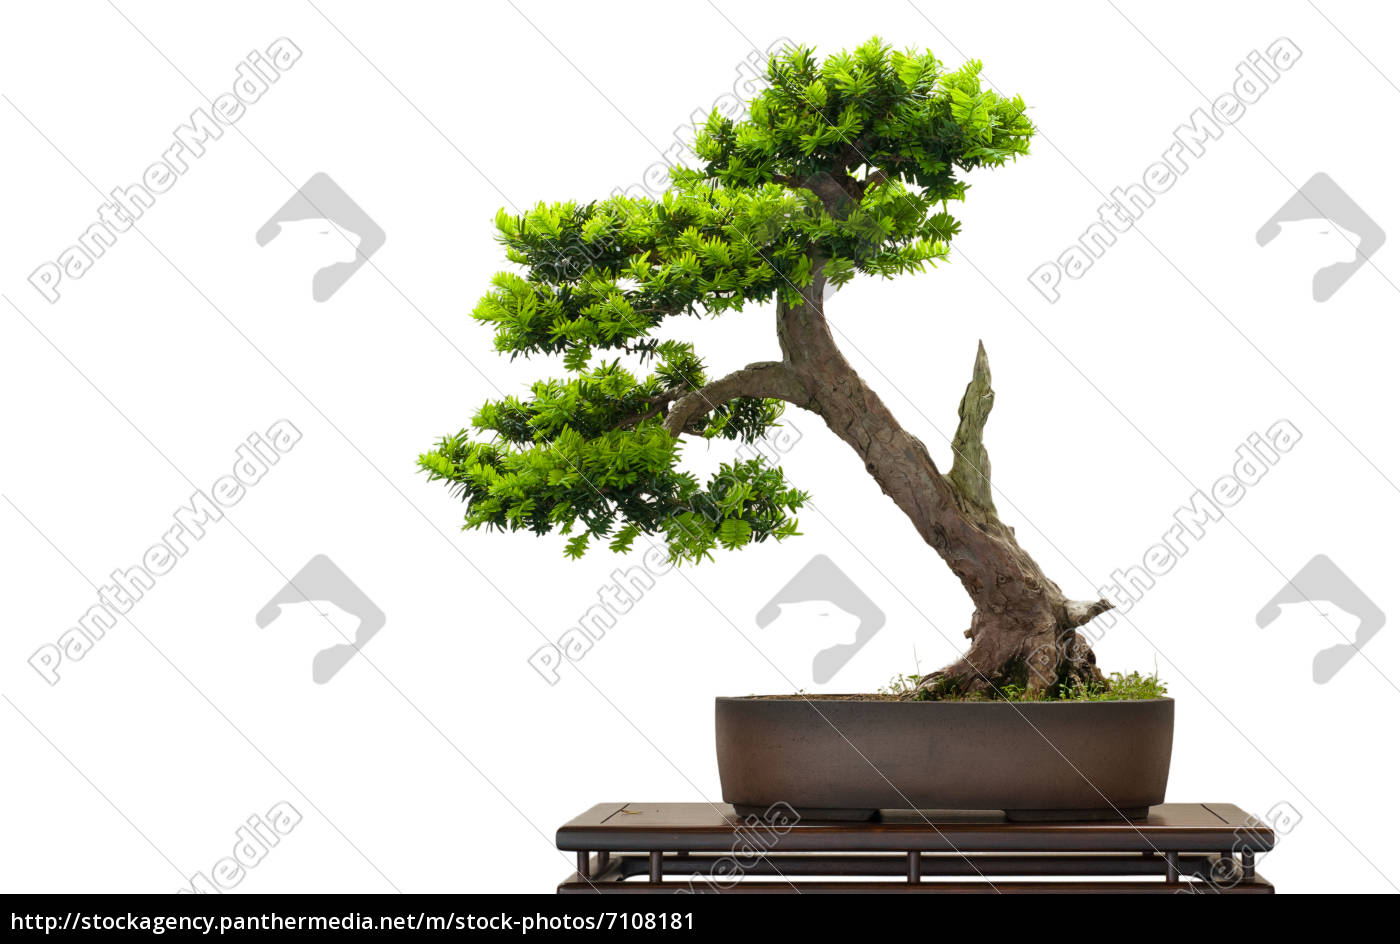 japanische eibe als bonsai baum lizenzfreies bild 7108181 bildagentur panthermedia. Black Bedroom Furniture Sets. Home Design Ideas